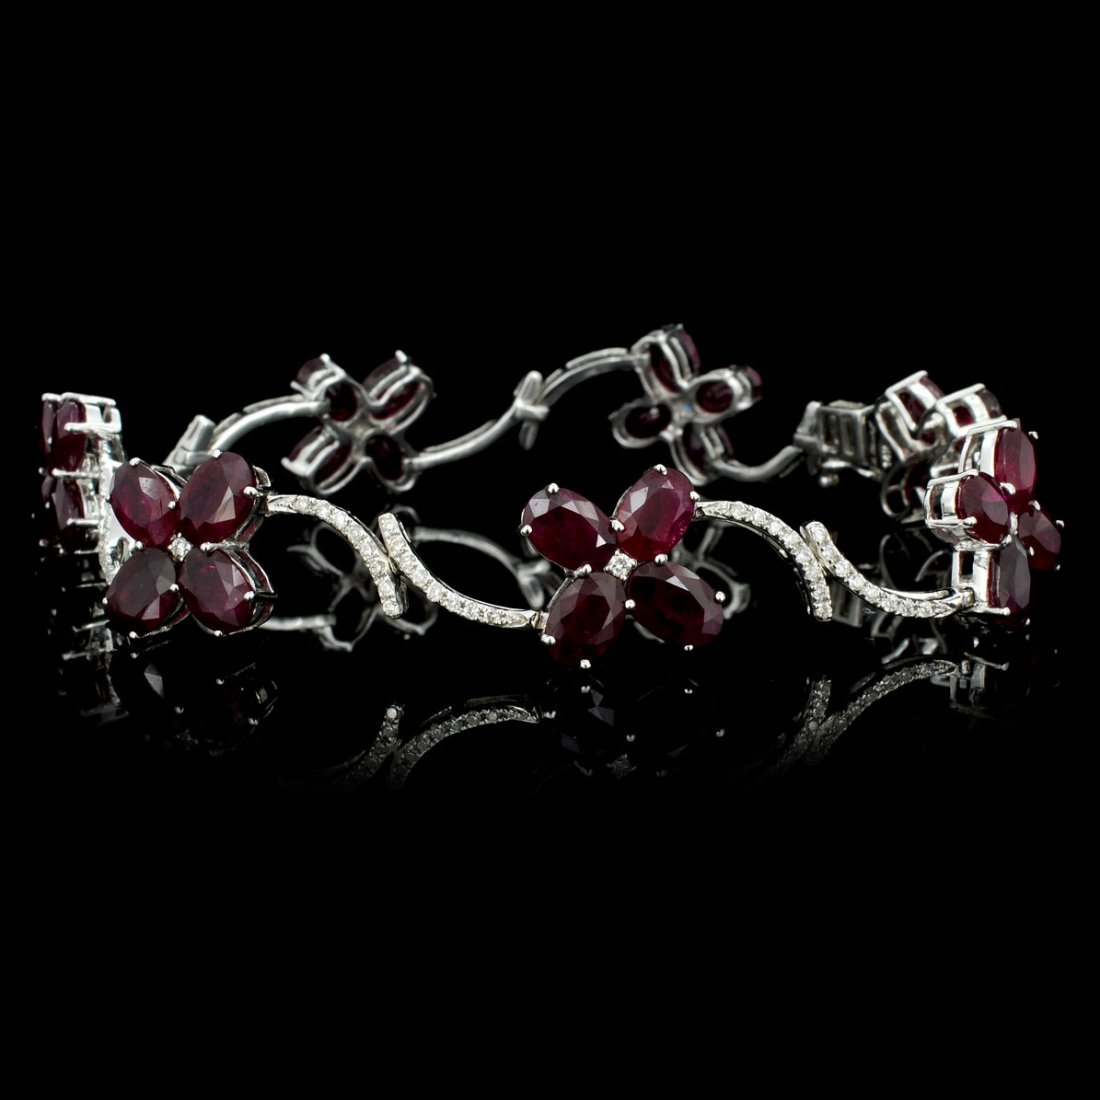 14K Gold 17.45ct Ruby & 1.14ct Diamond Bracelet